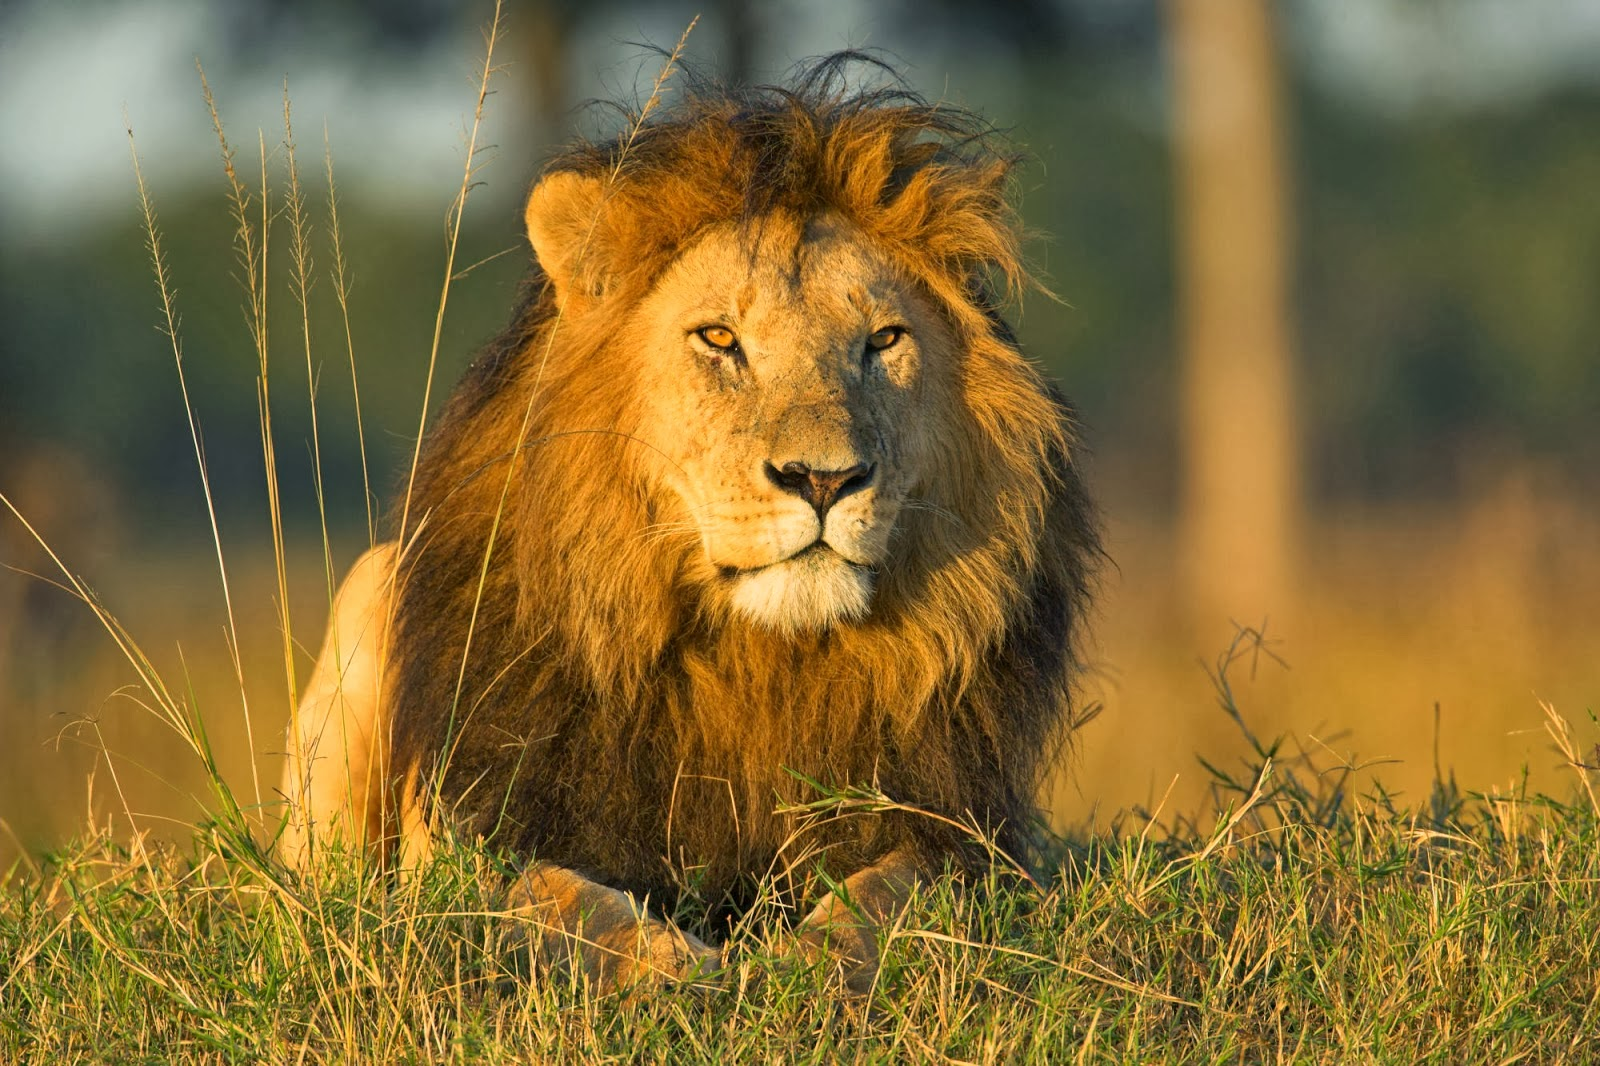 Best Wallpaper Lion Facebook - lion+wallpapers+hd+(8)  Gallery_45575.jpg